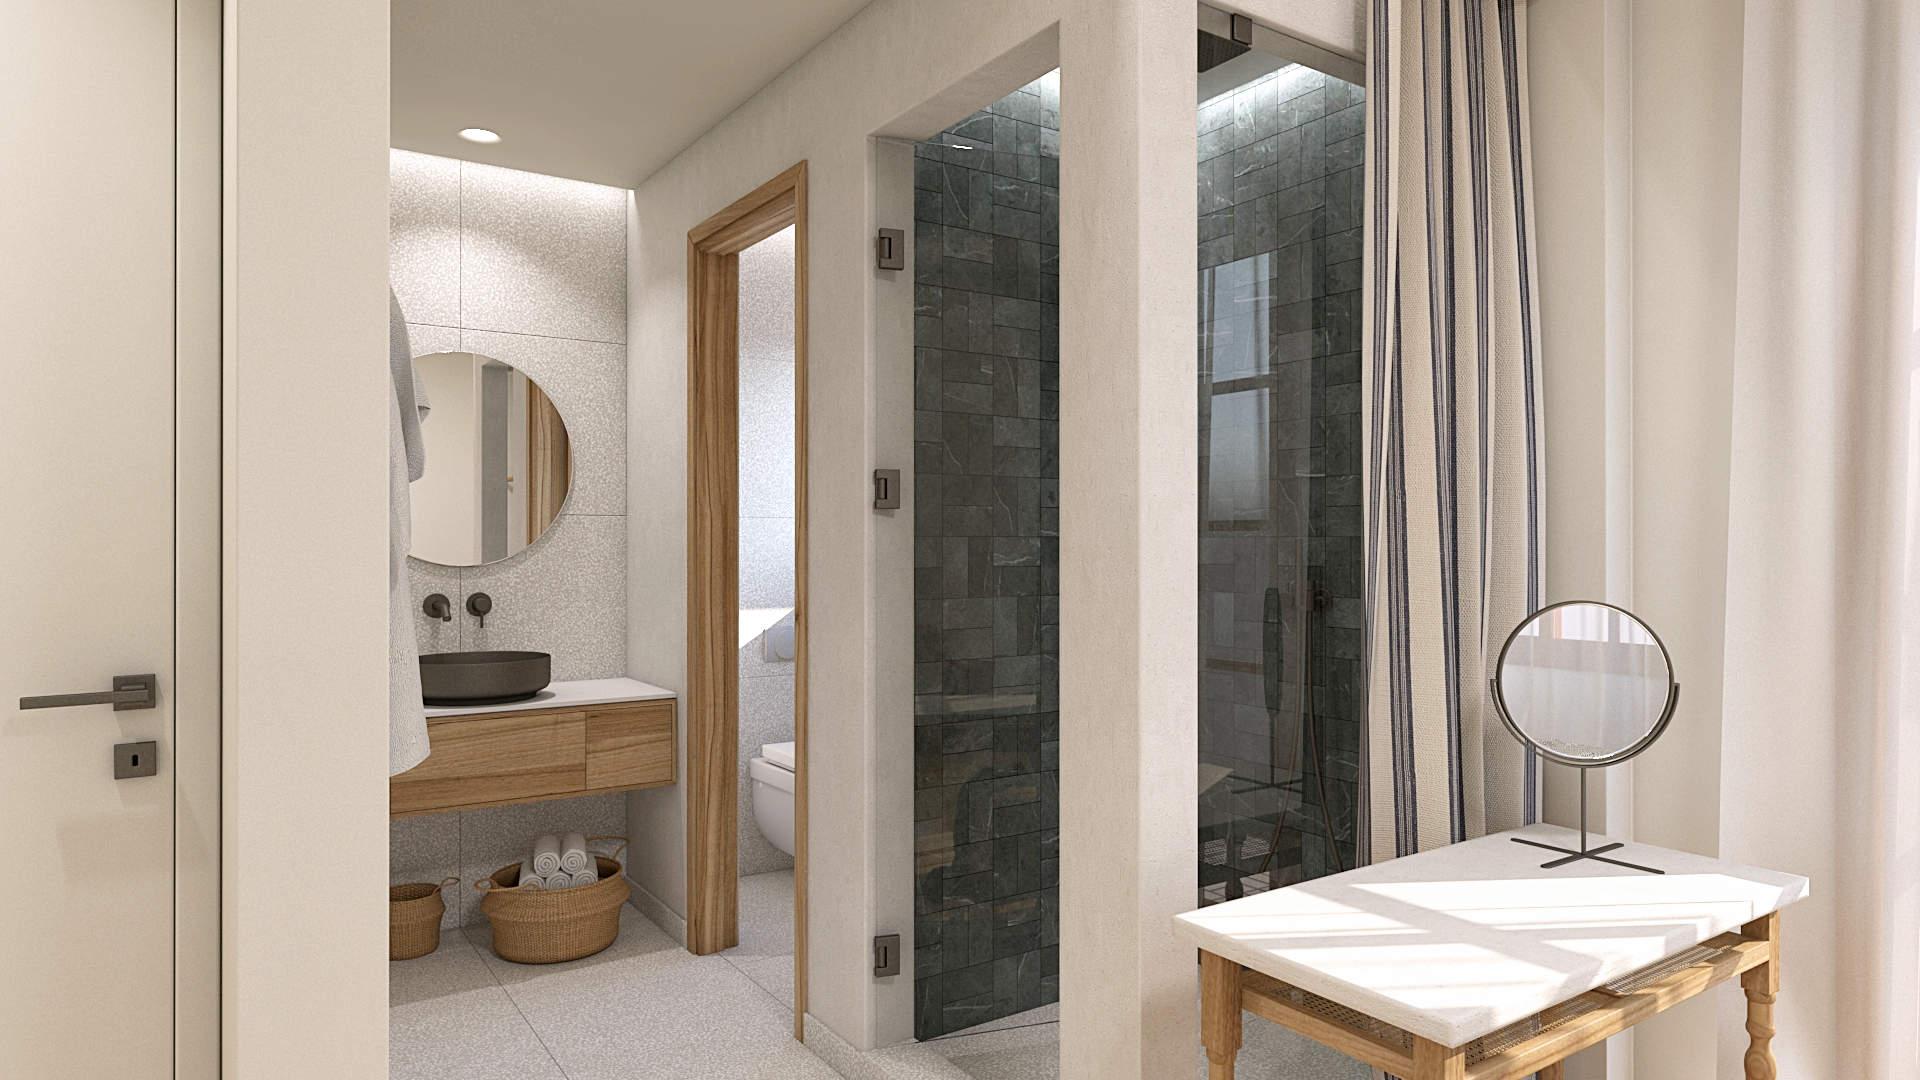 apartment renovation, master bedroom, bathroom addition, . Μερική αναδιαμόρφωση κατοικίας, προσθήκη μπάνιου σε υπνοδωμάτιο.